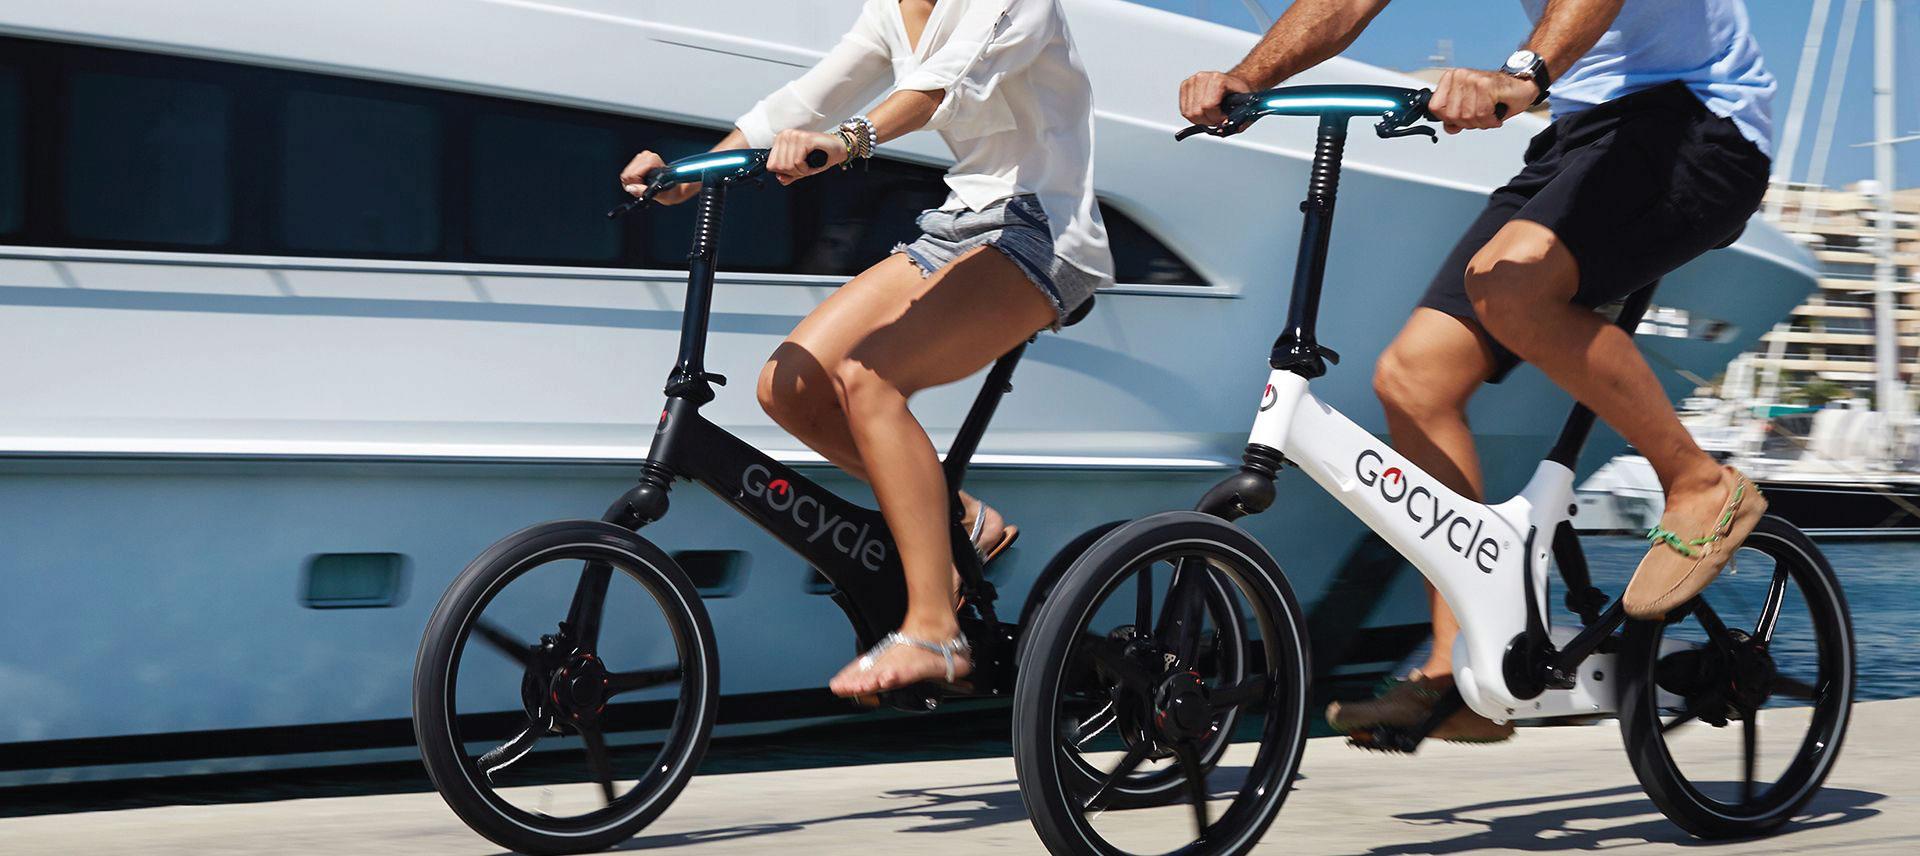 GoCycle Couple Riding G3C | The Garage OTR